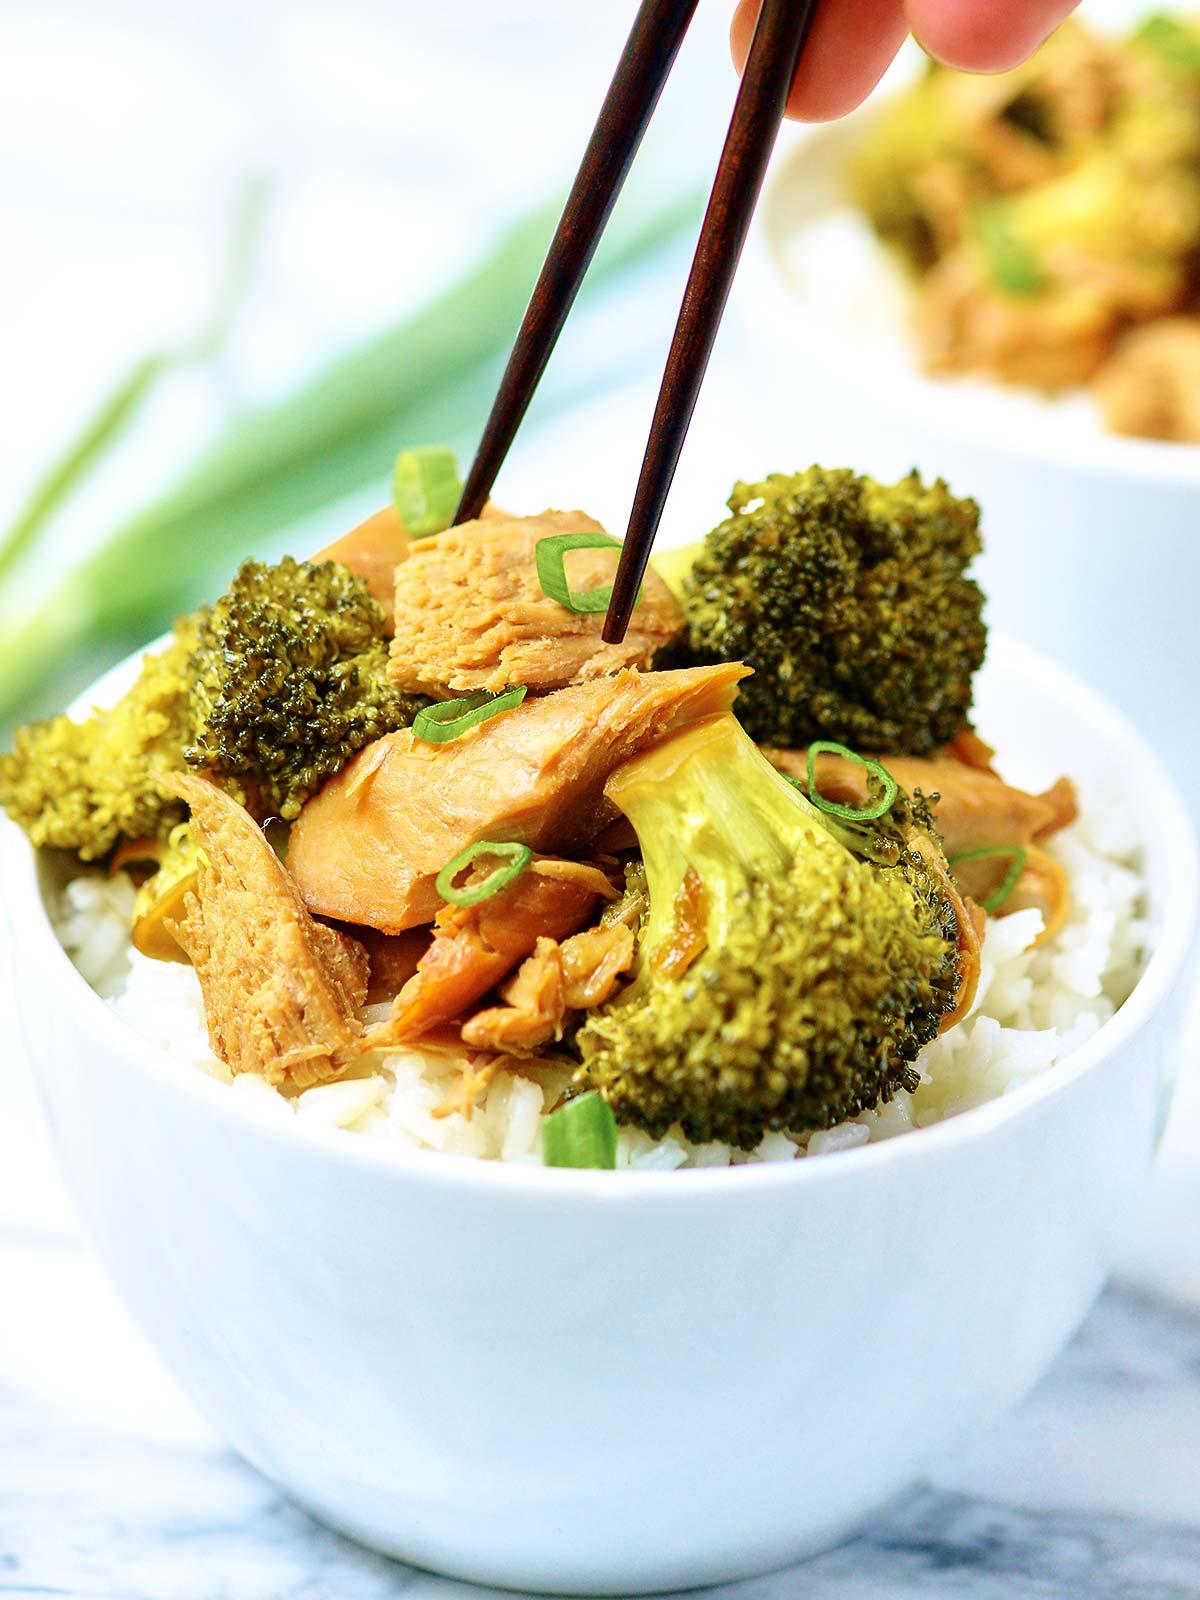 Crockpot-Chicken-Broccoli-Chopsticks